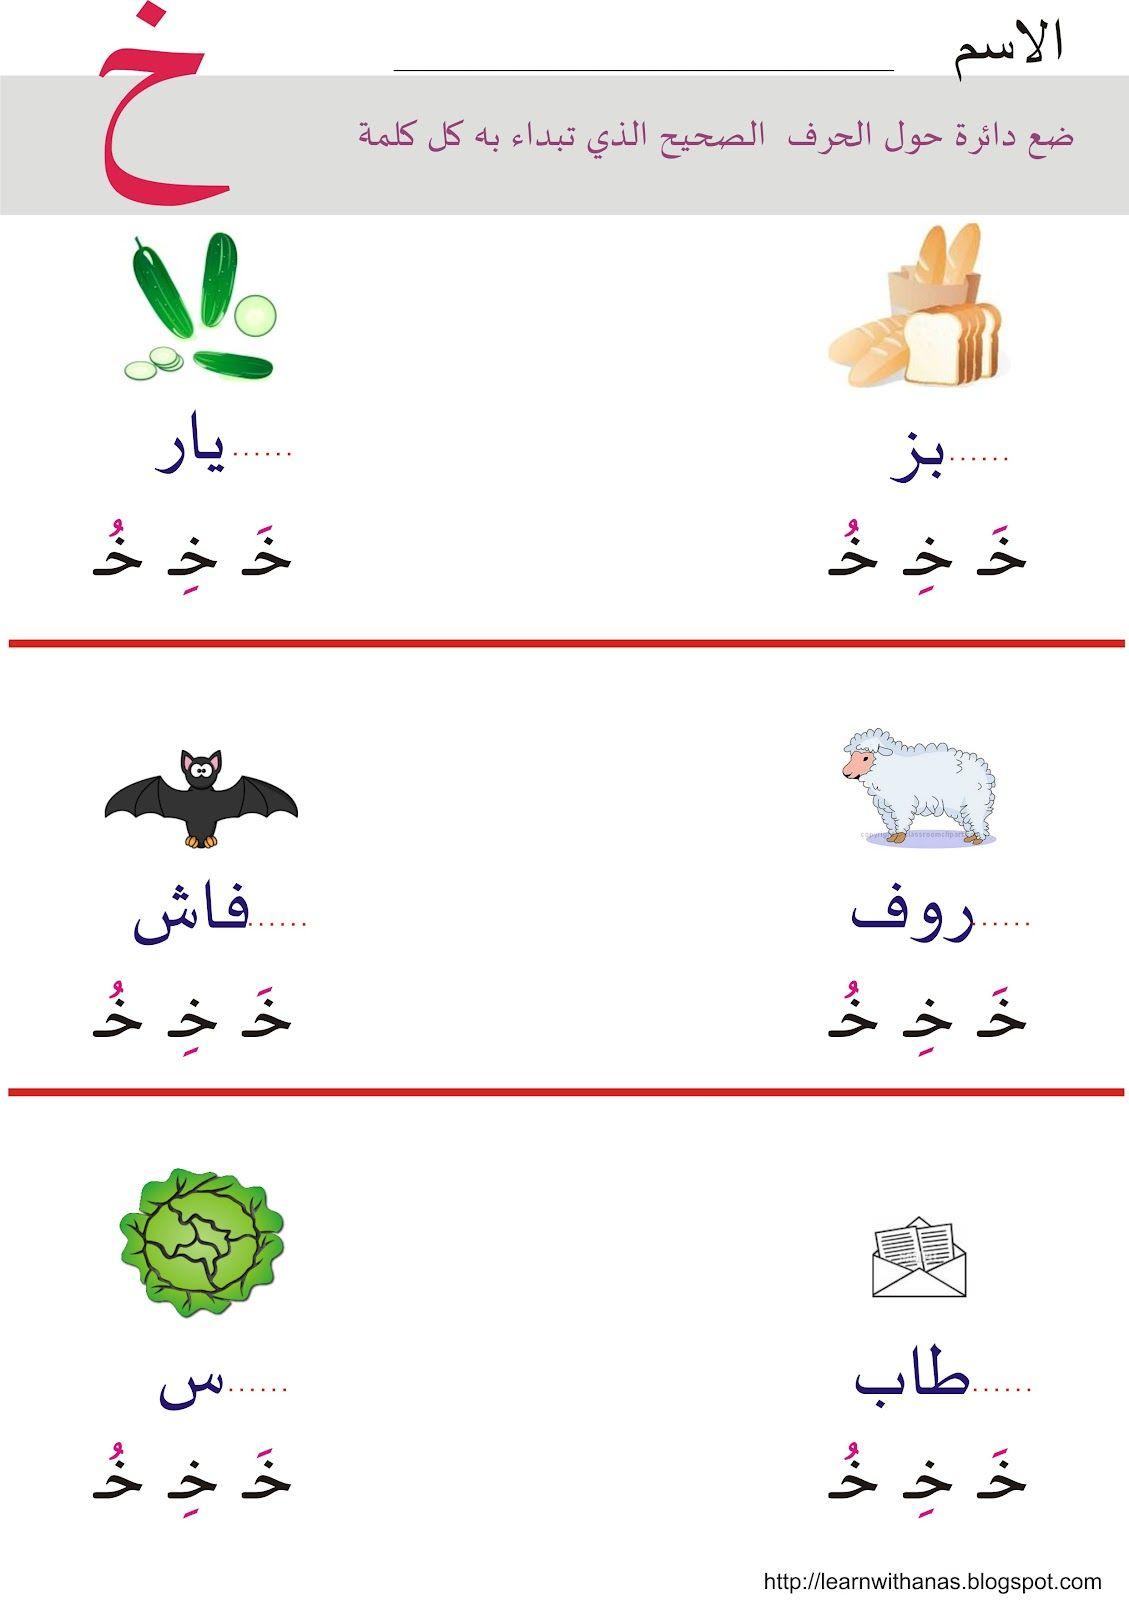 Arabic diacritics - Wikipedia